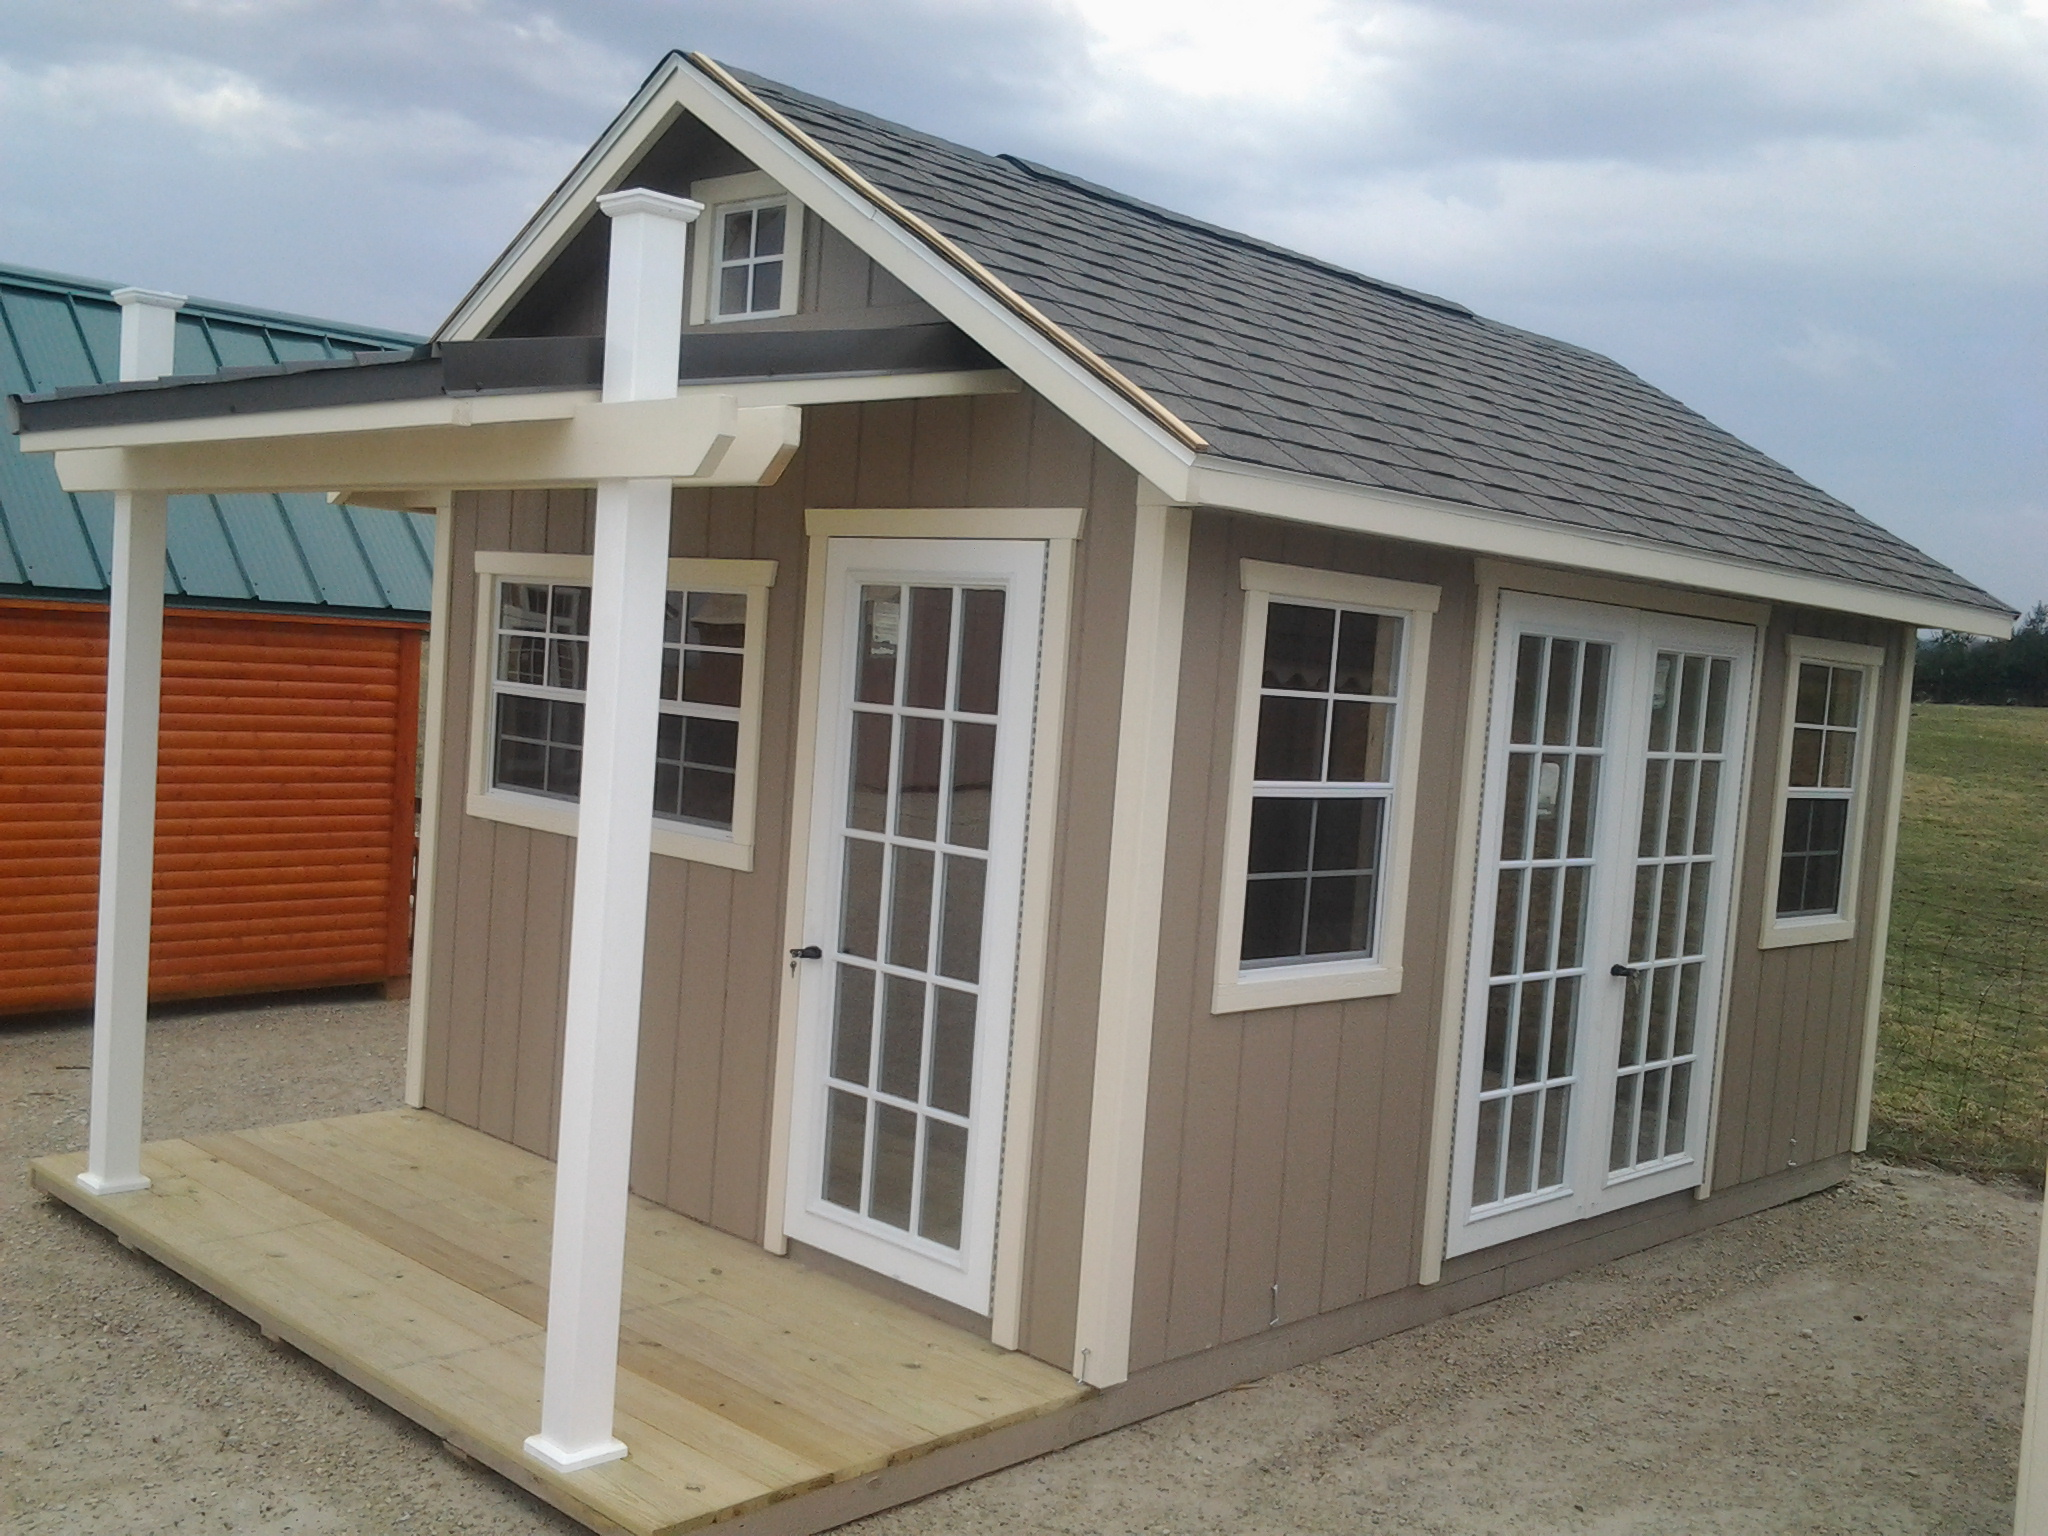 10x16 Garden Shed w/ Porch